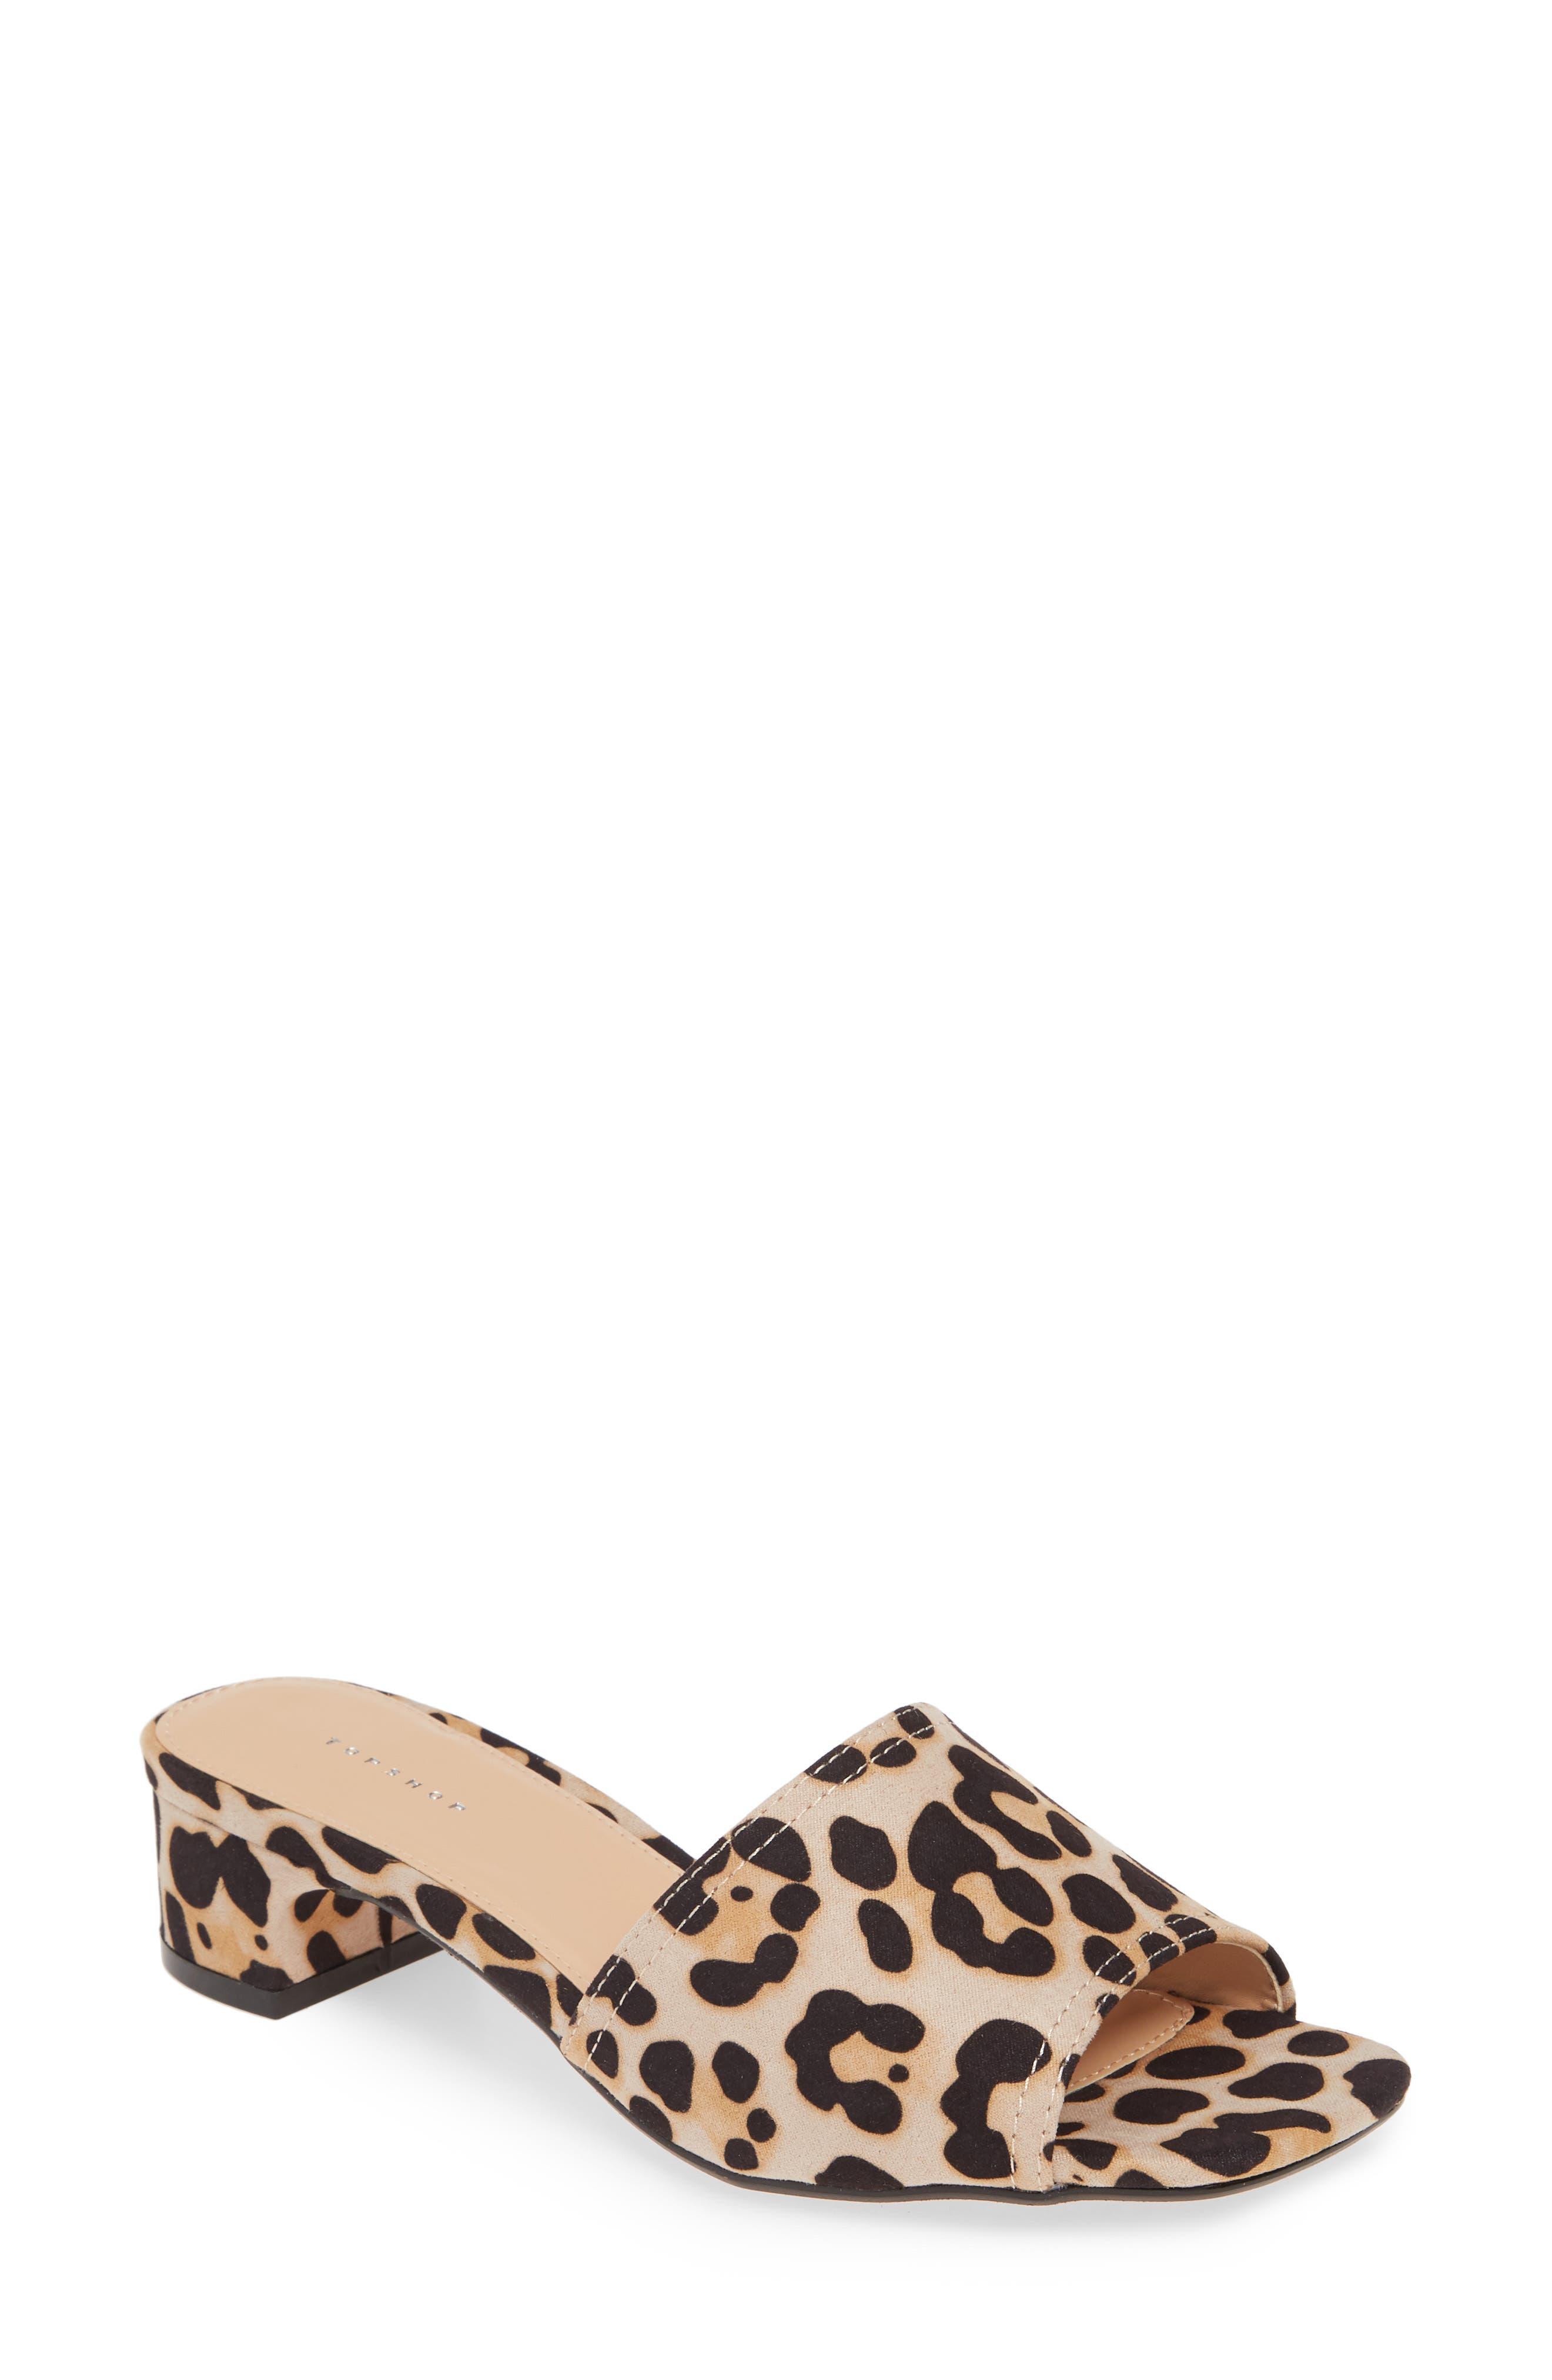 Diva Slide Sandal, Main, color, BROWN MULTI